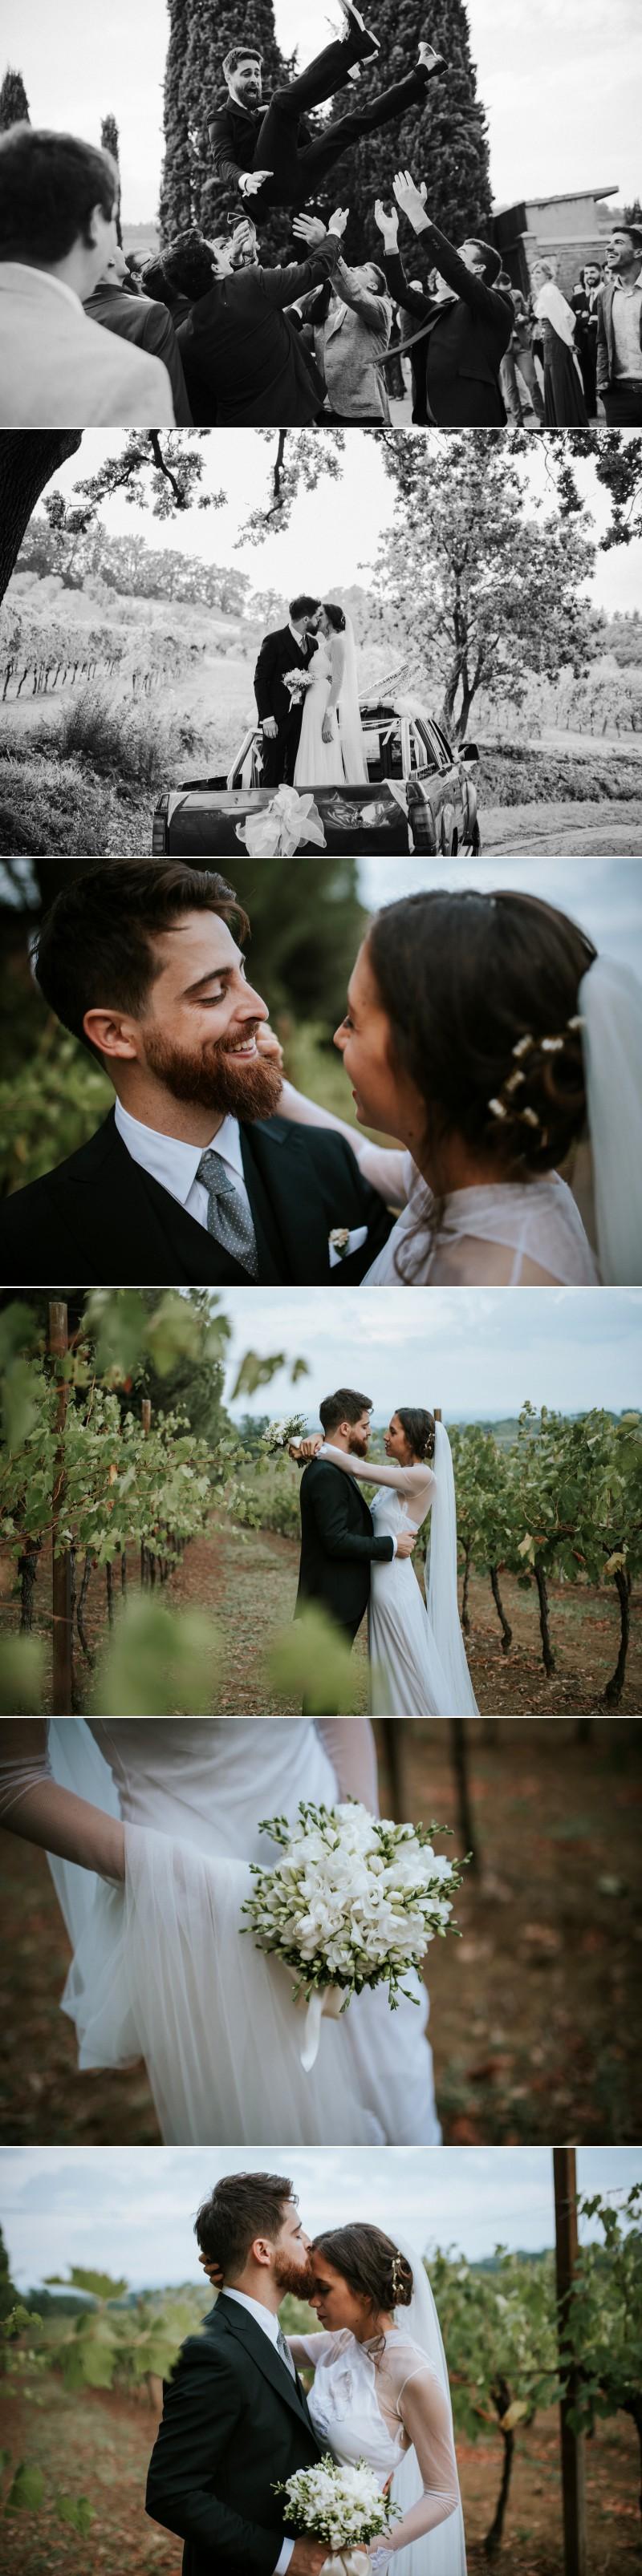 Bologna Ravenna Destination Wedding Photographer 7